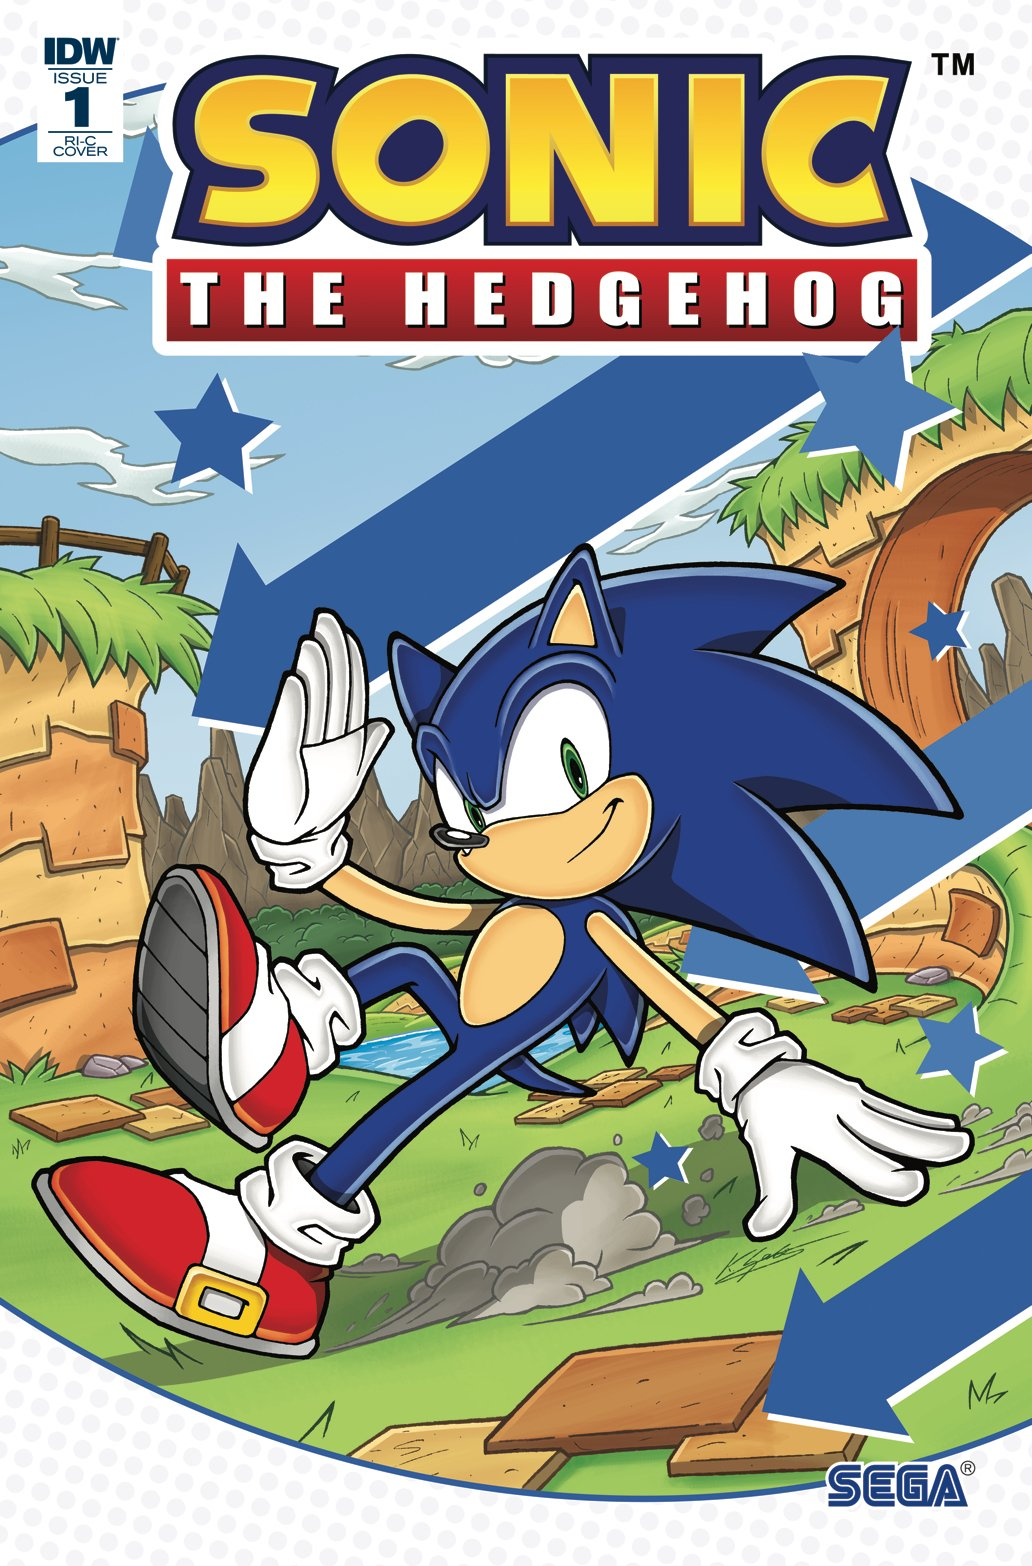 Sonic the Hedgehog 001 (April 2018) (RI-C cover)